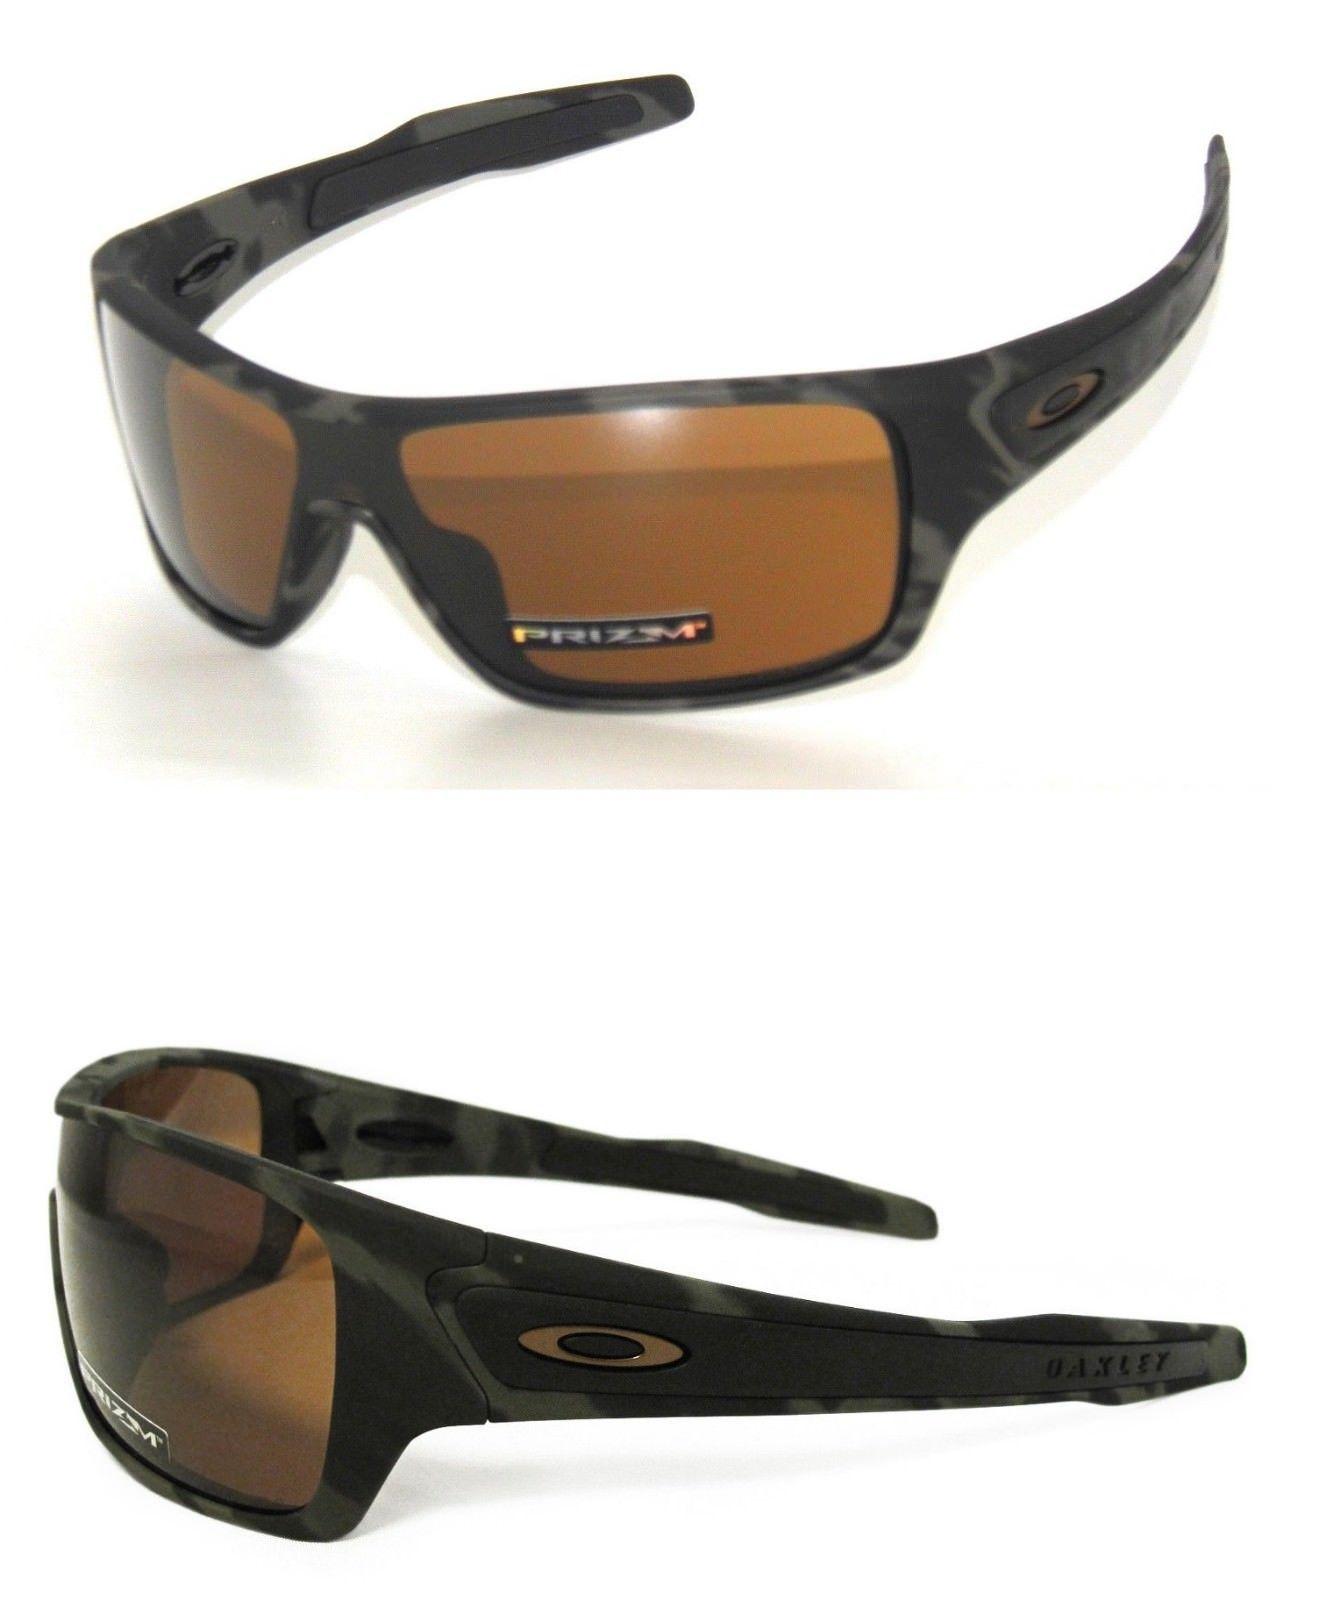 783b7b1696672 ... black camo prizm 7ed0a f8a49  new zealand new oakley turbine rotor  sunglasses olive camo prizm tungsten 9307 17 9307 1732 4bdcb